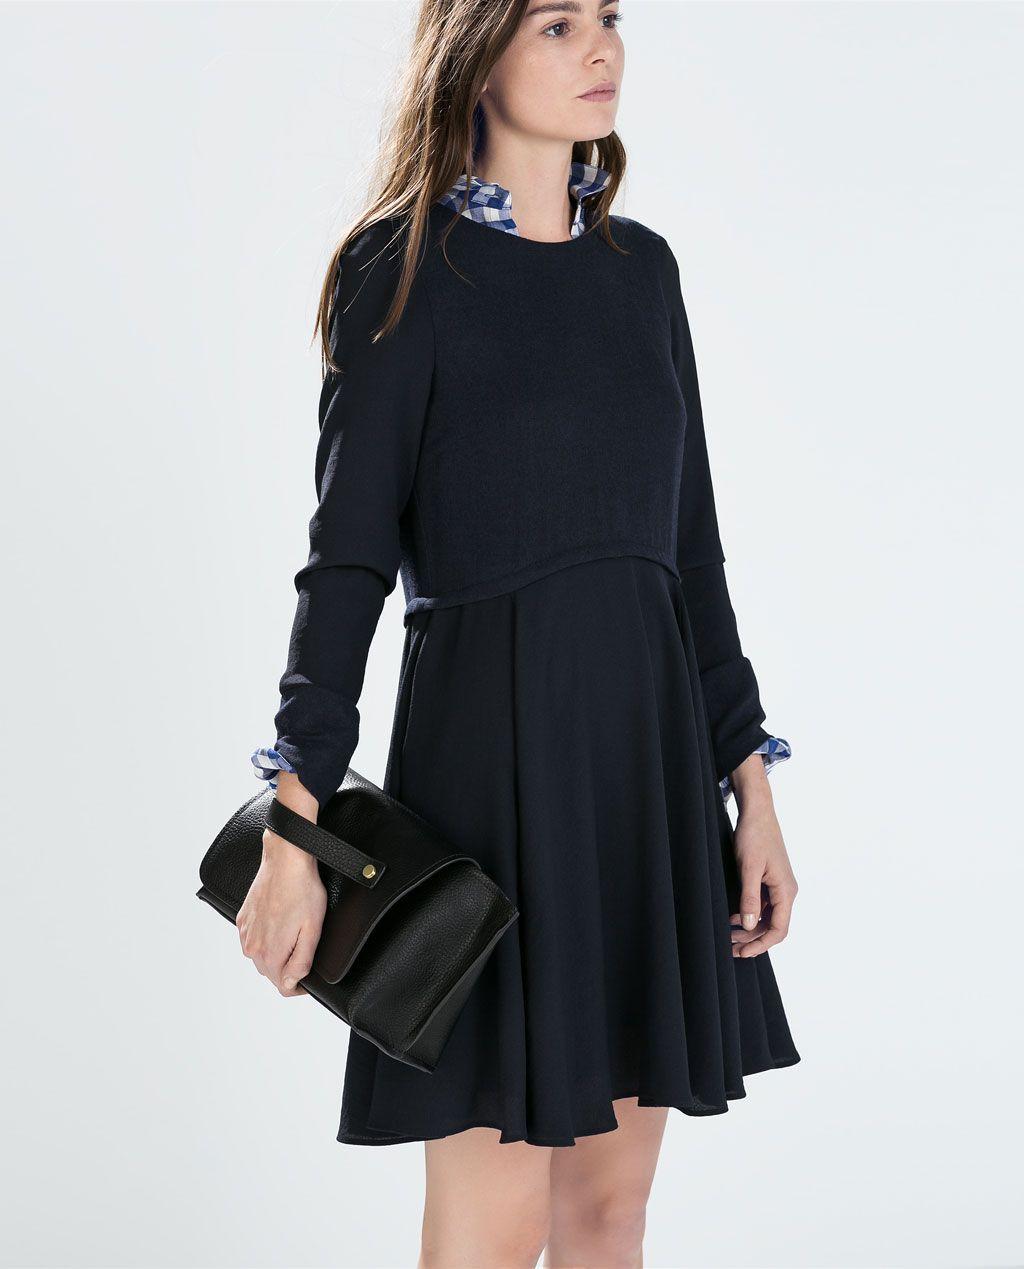 LONG-SLEEVED FLARED DRESS from Zara